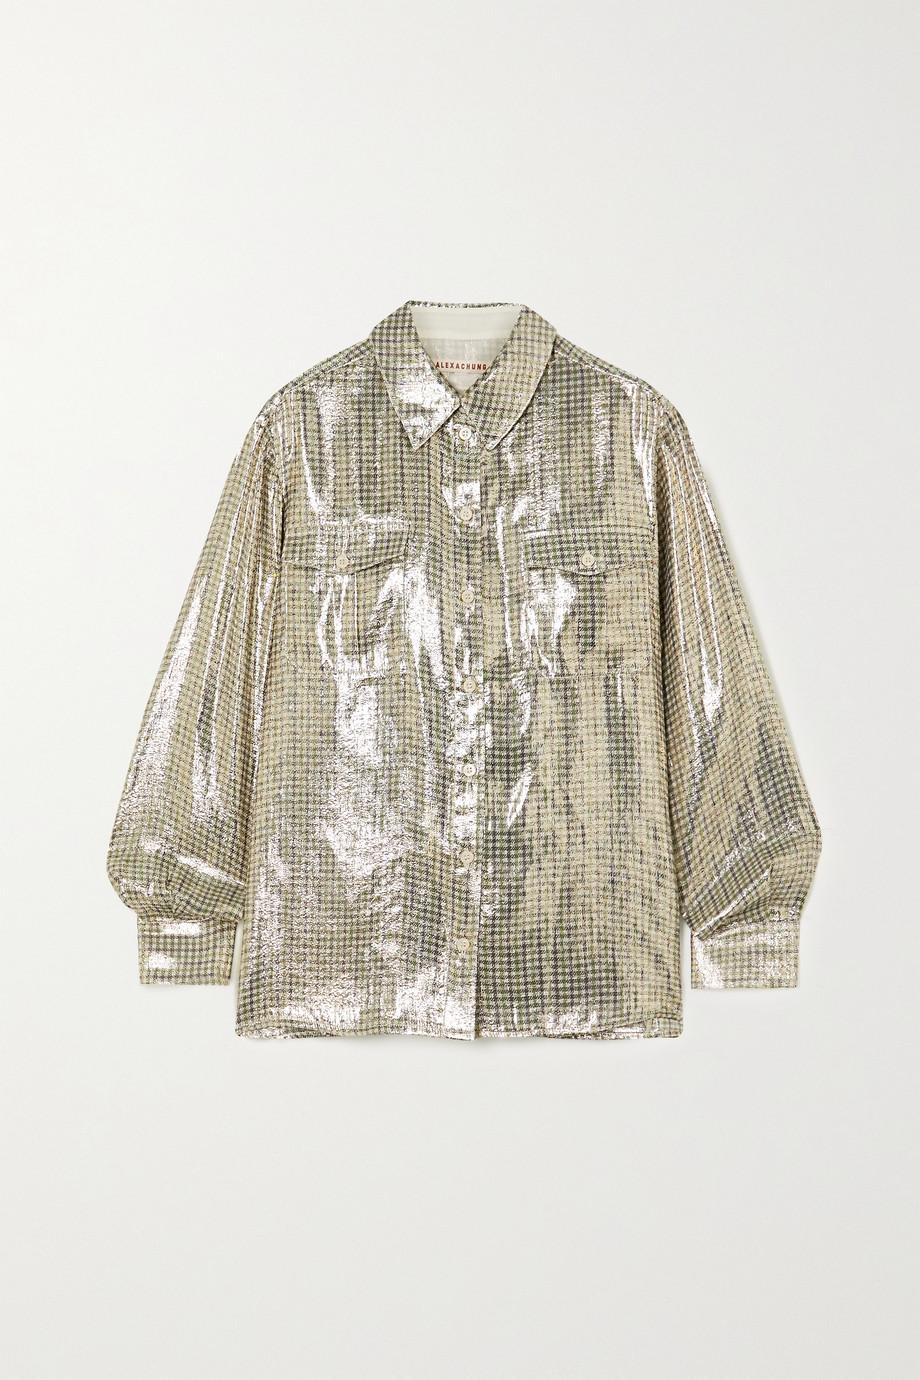 ALEXACHUNG 金属感格纹真丝混纺衬衫